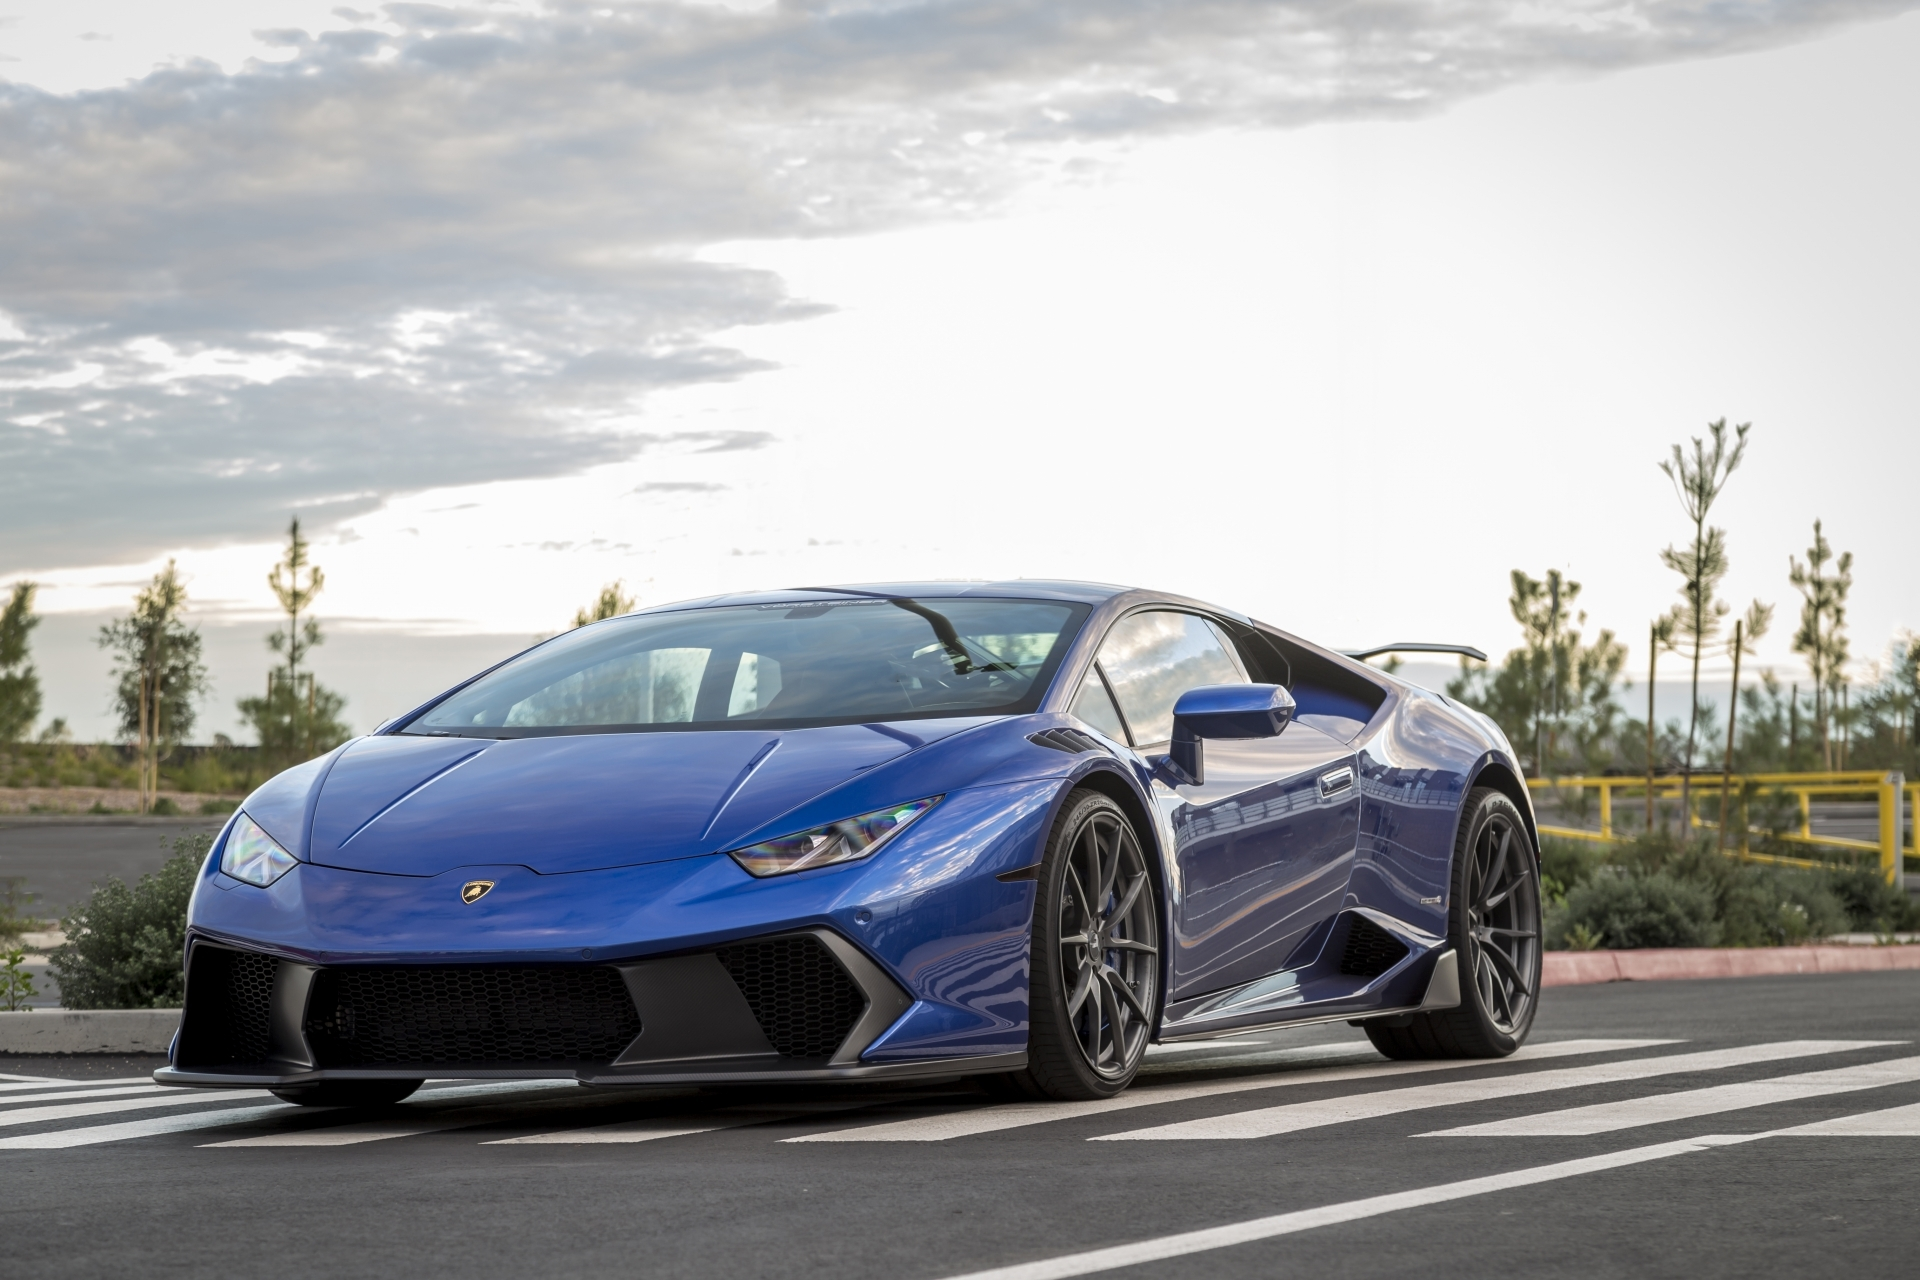 Vorsteiner Nero body kit for Lamborghini Huracan Novara